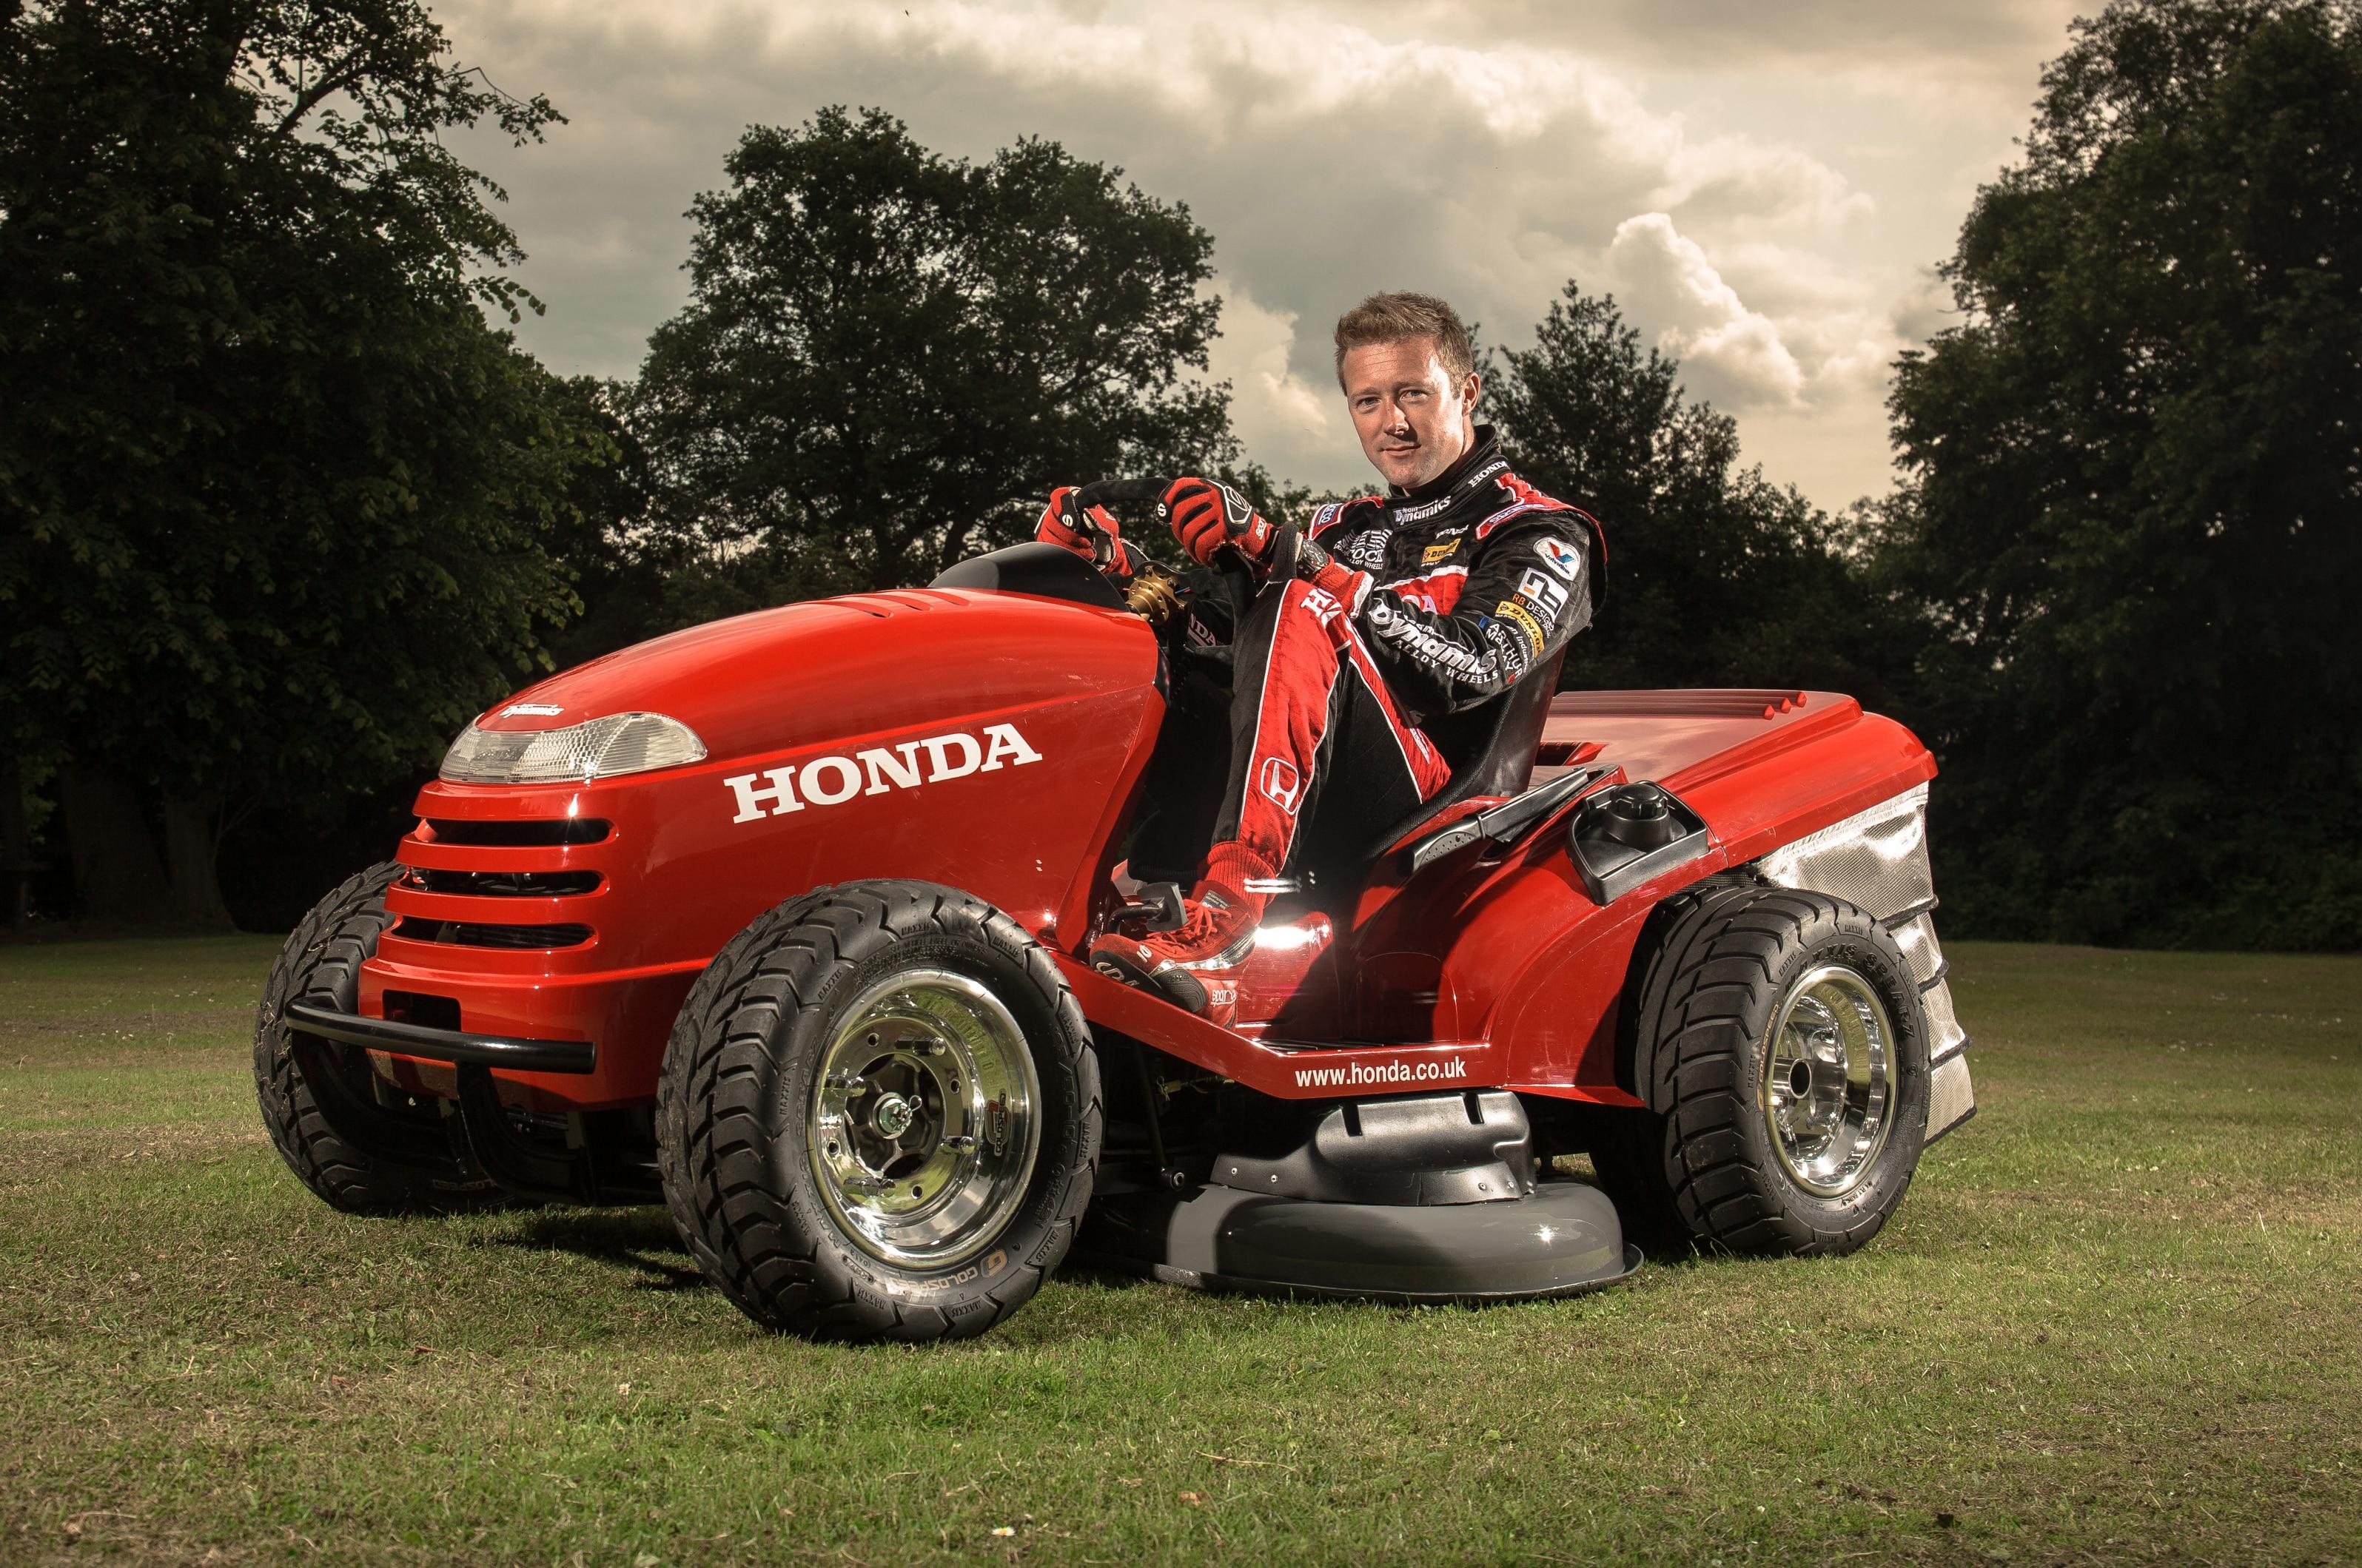 Honda Builds Crazy 135 Mph Lawn Tractor